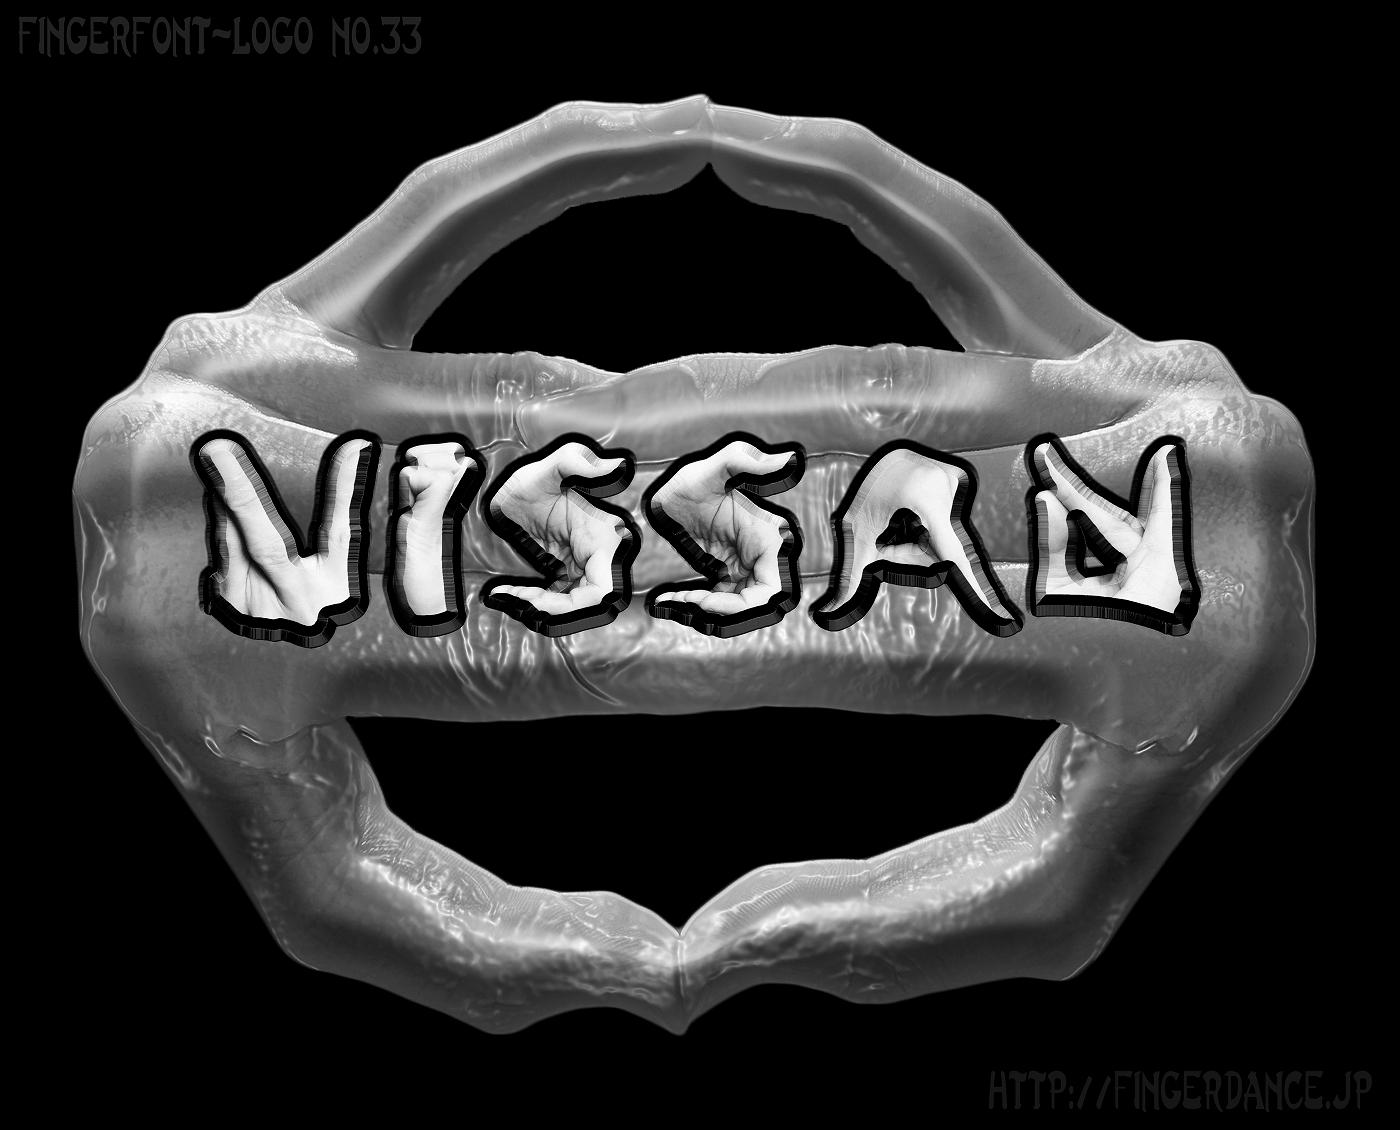 nissan-fingerhttp://fingerdance.jp/L/logohand ニッサン自動車フィンガーロゴハンド手指